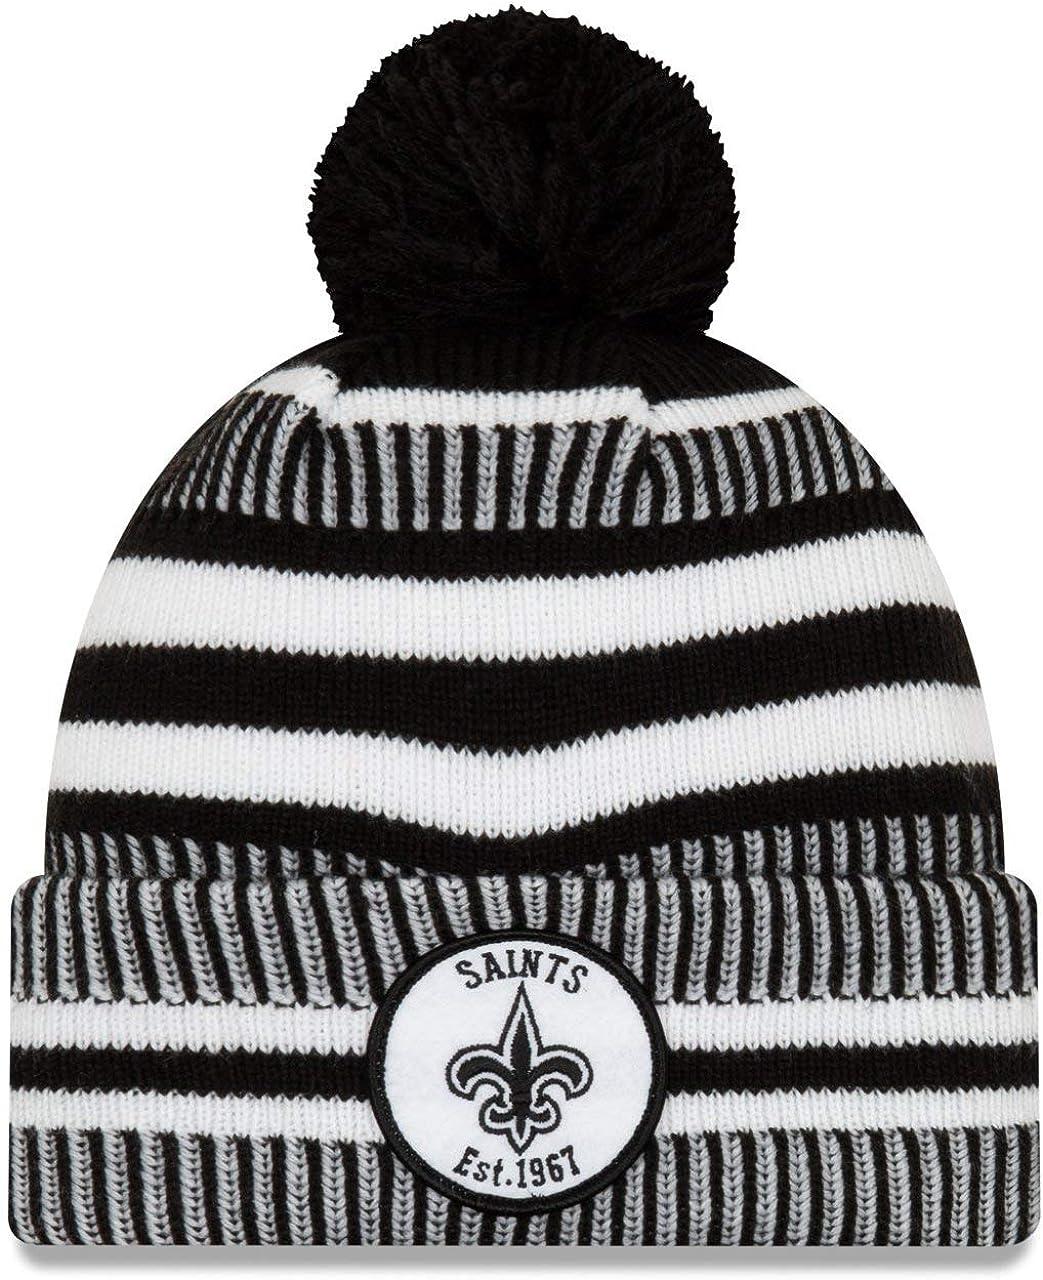 New Era New Orleans Saints Beanie Knit NFL 2019 Sideline Home 1967